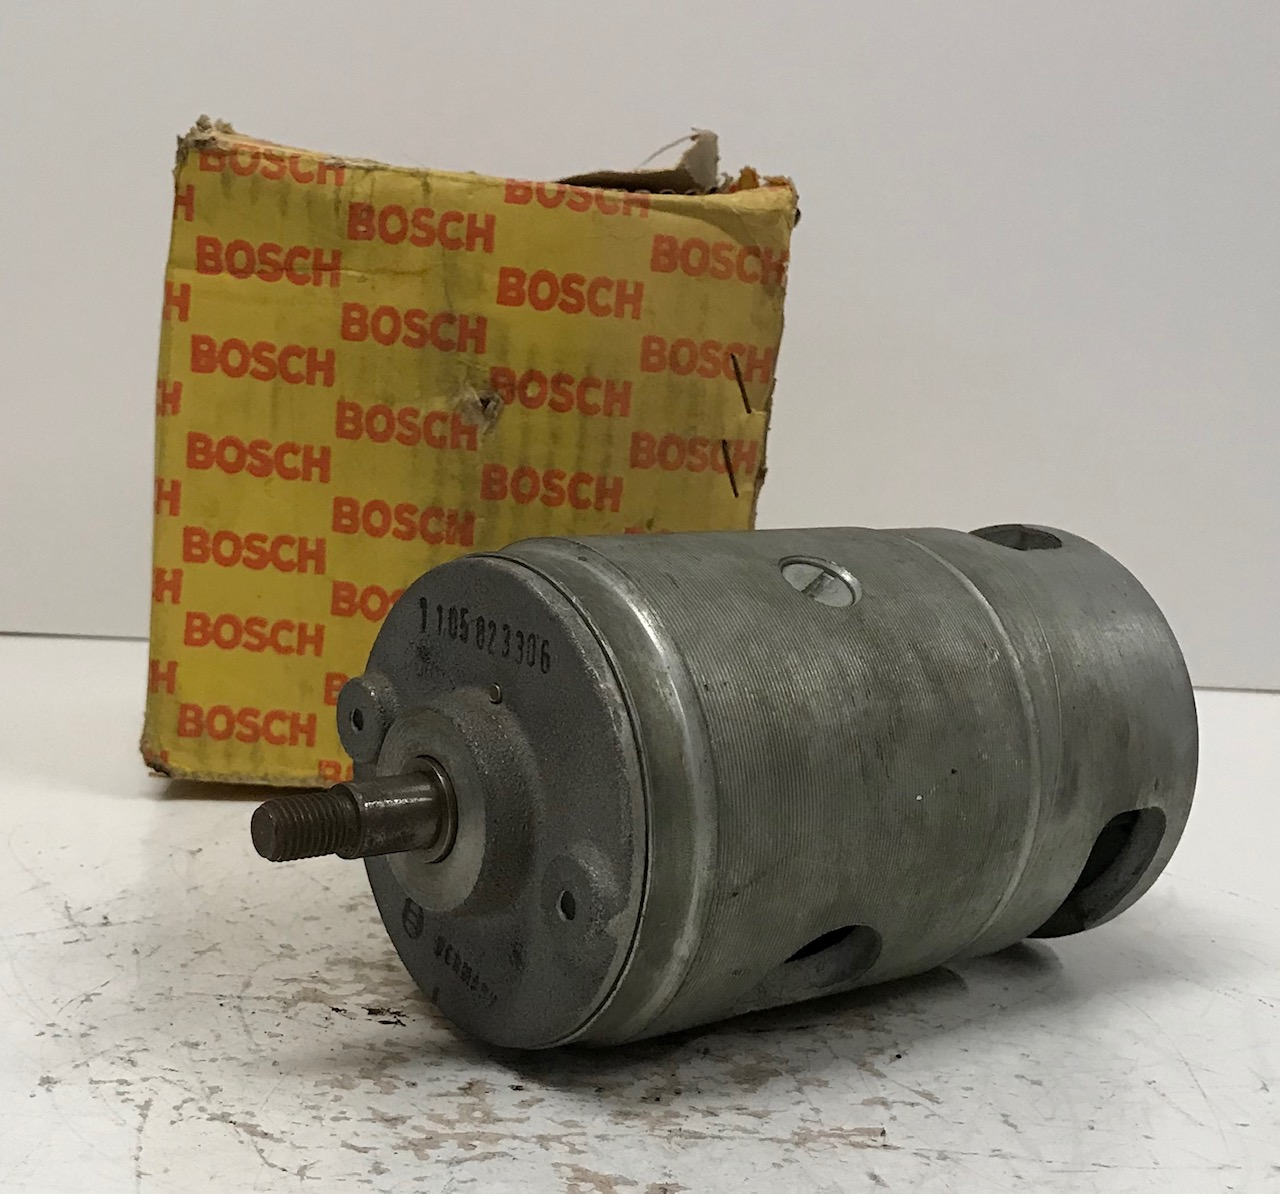 Bosch Gleichstromlichtmaschine 0001304001 14V/30A Generator ancre ancla anchor